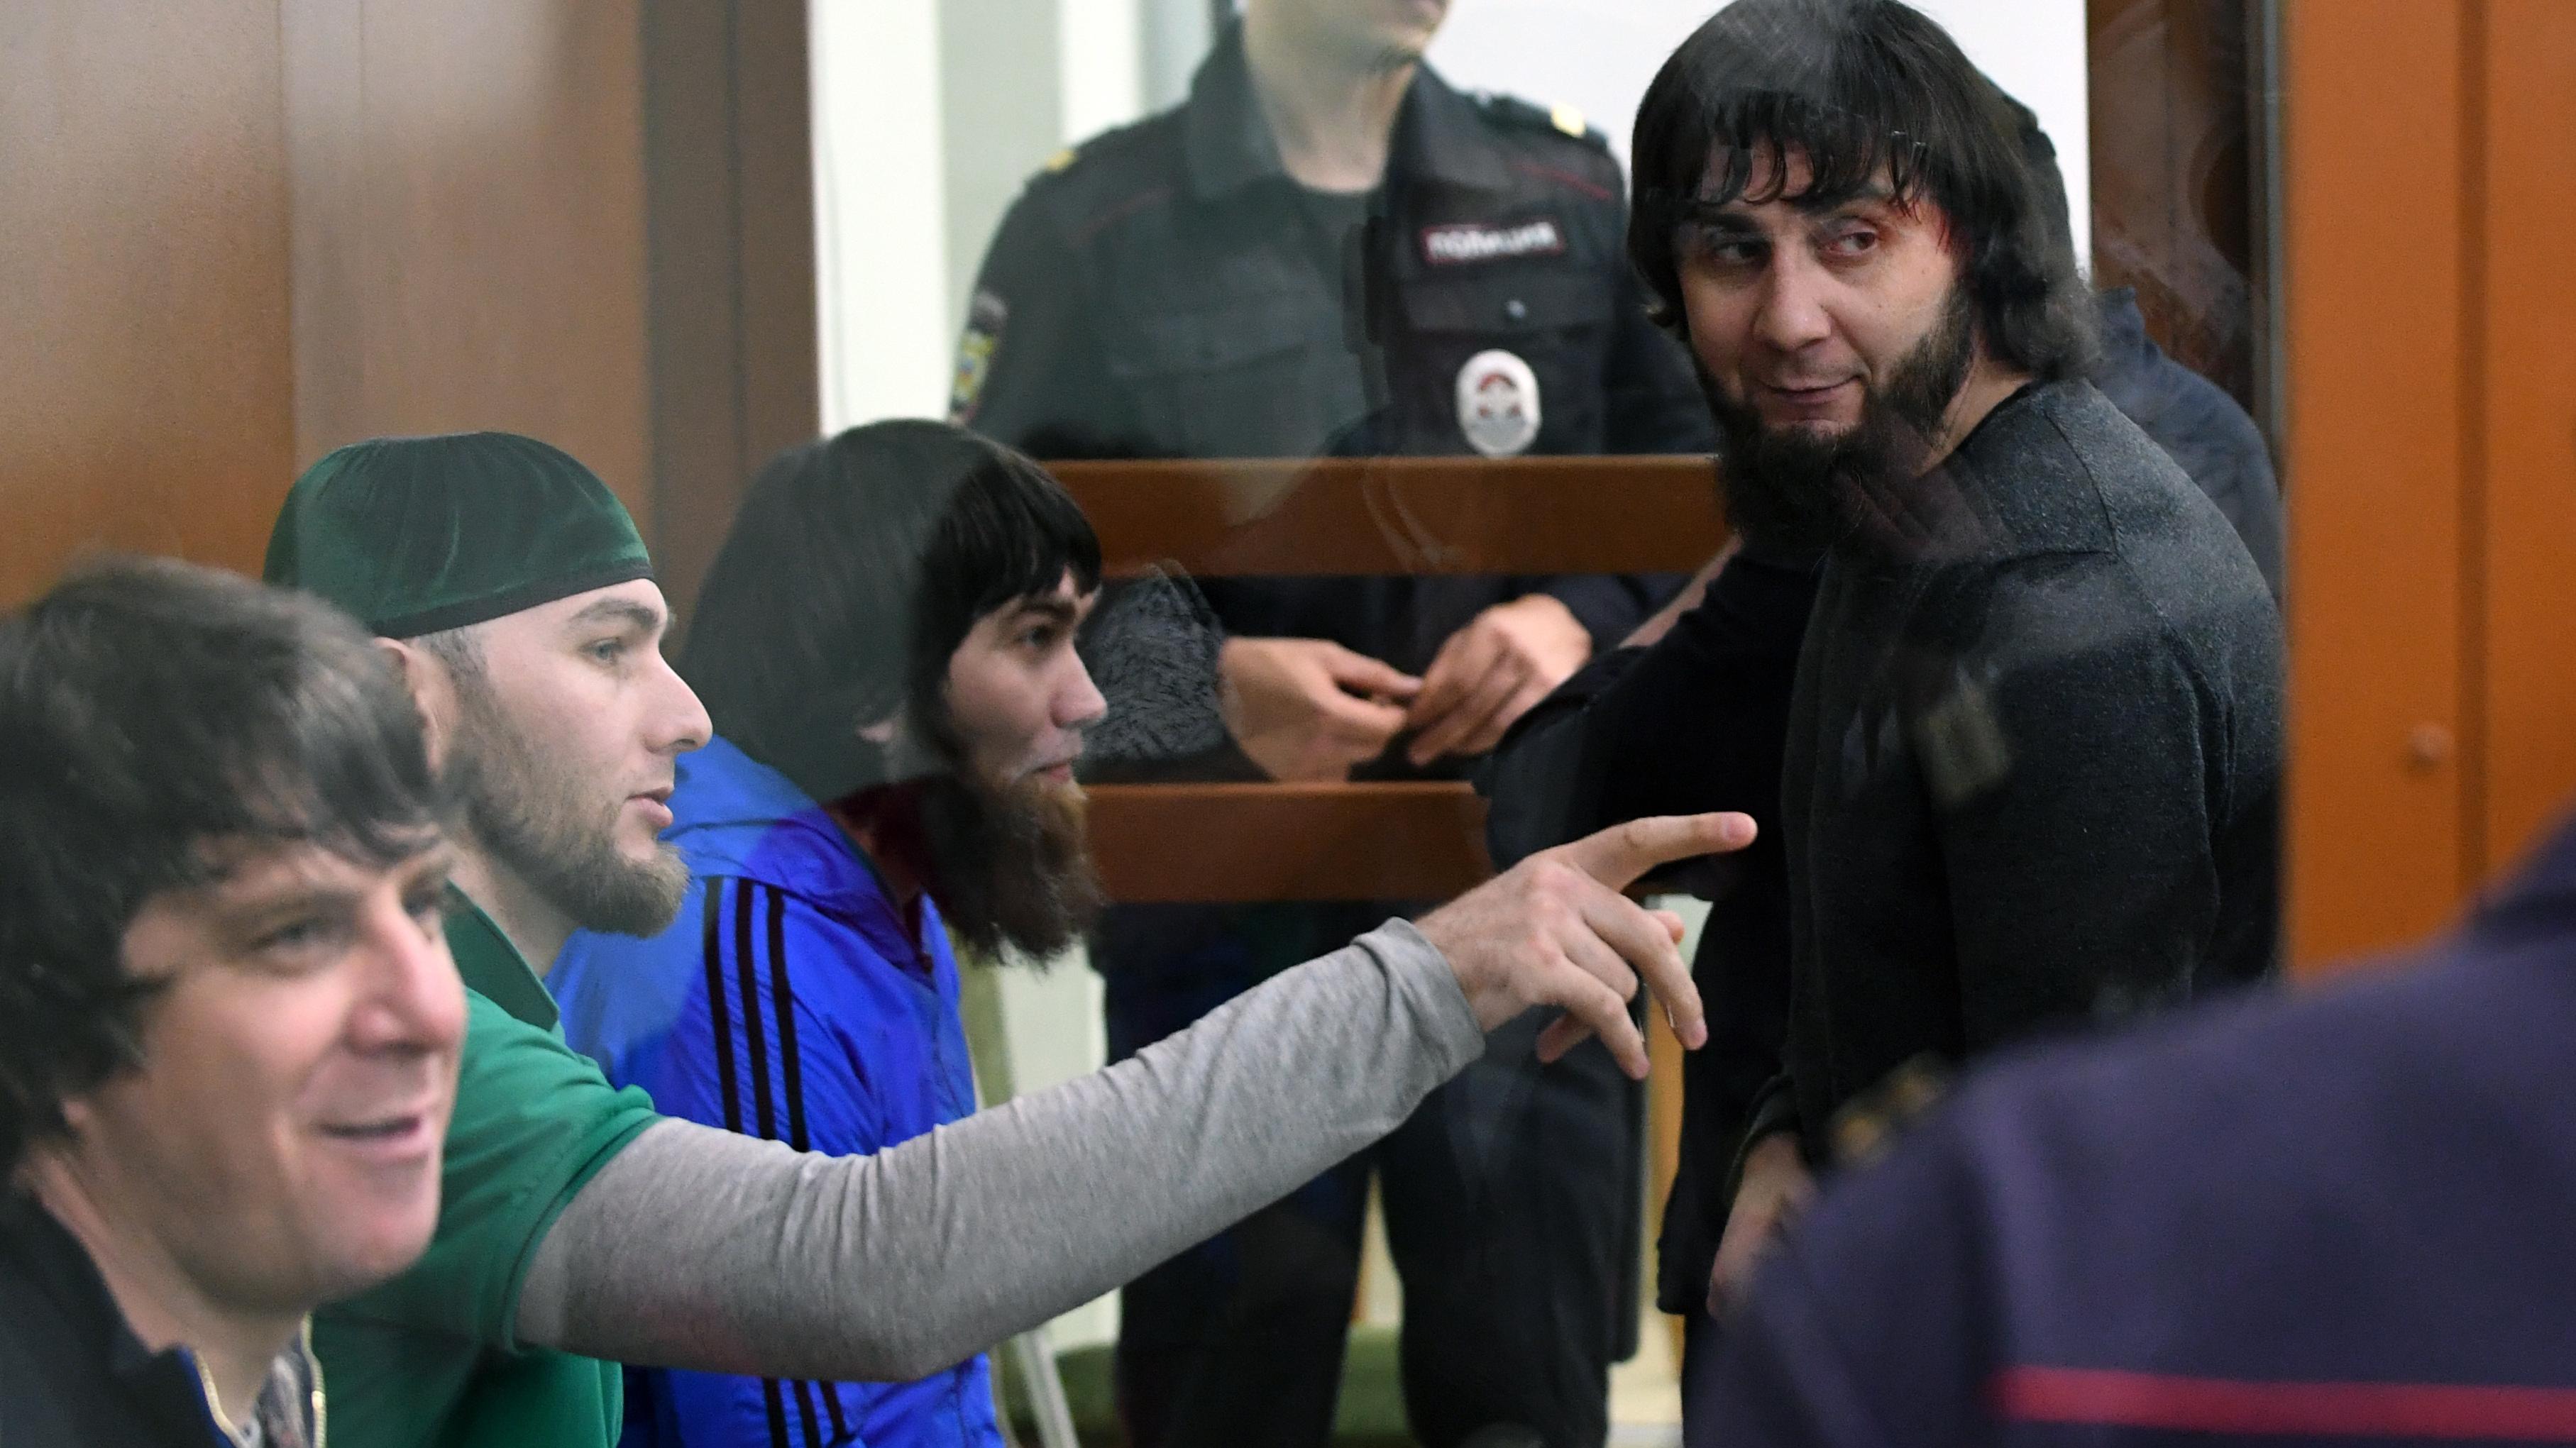 Boris Nemtsov murder: Five Chechens handed prison sentences